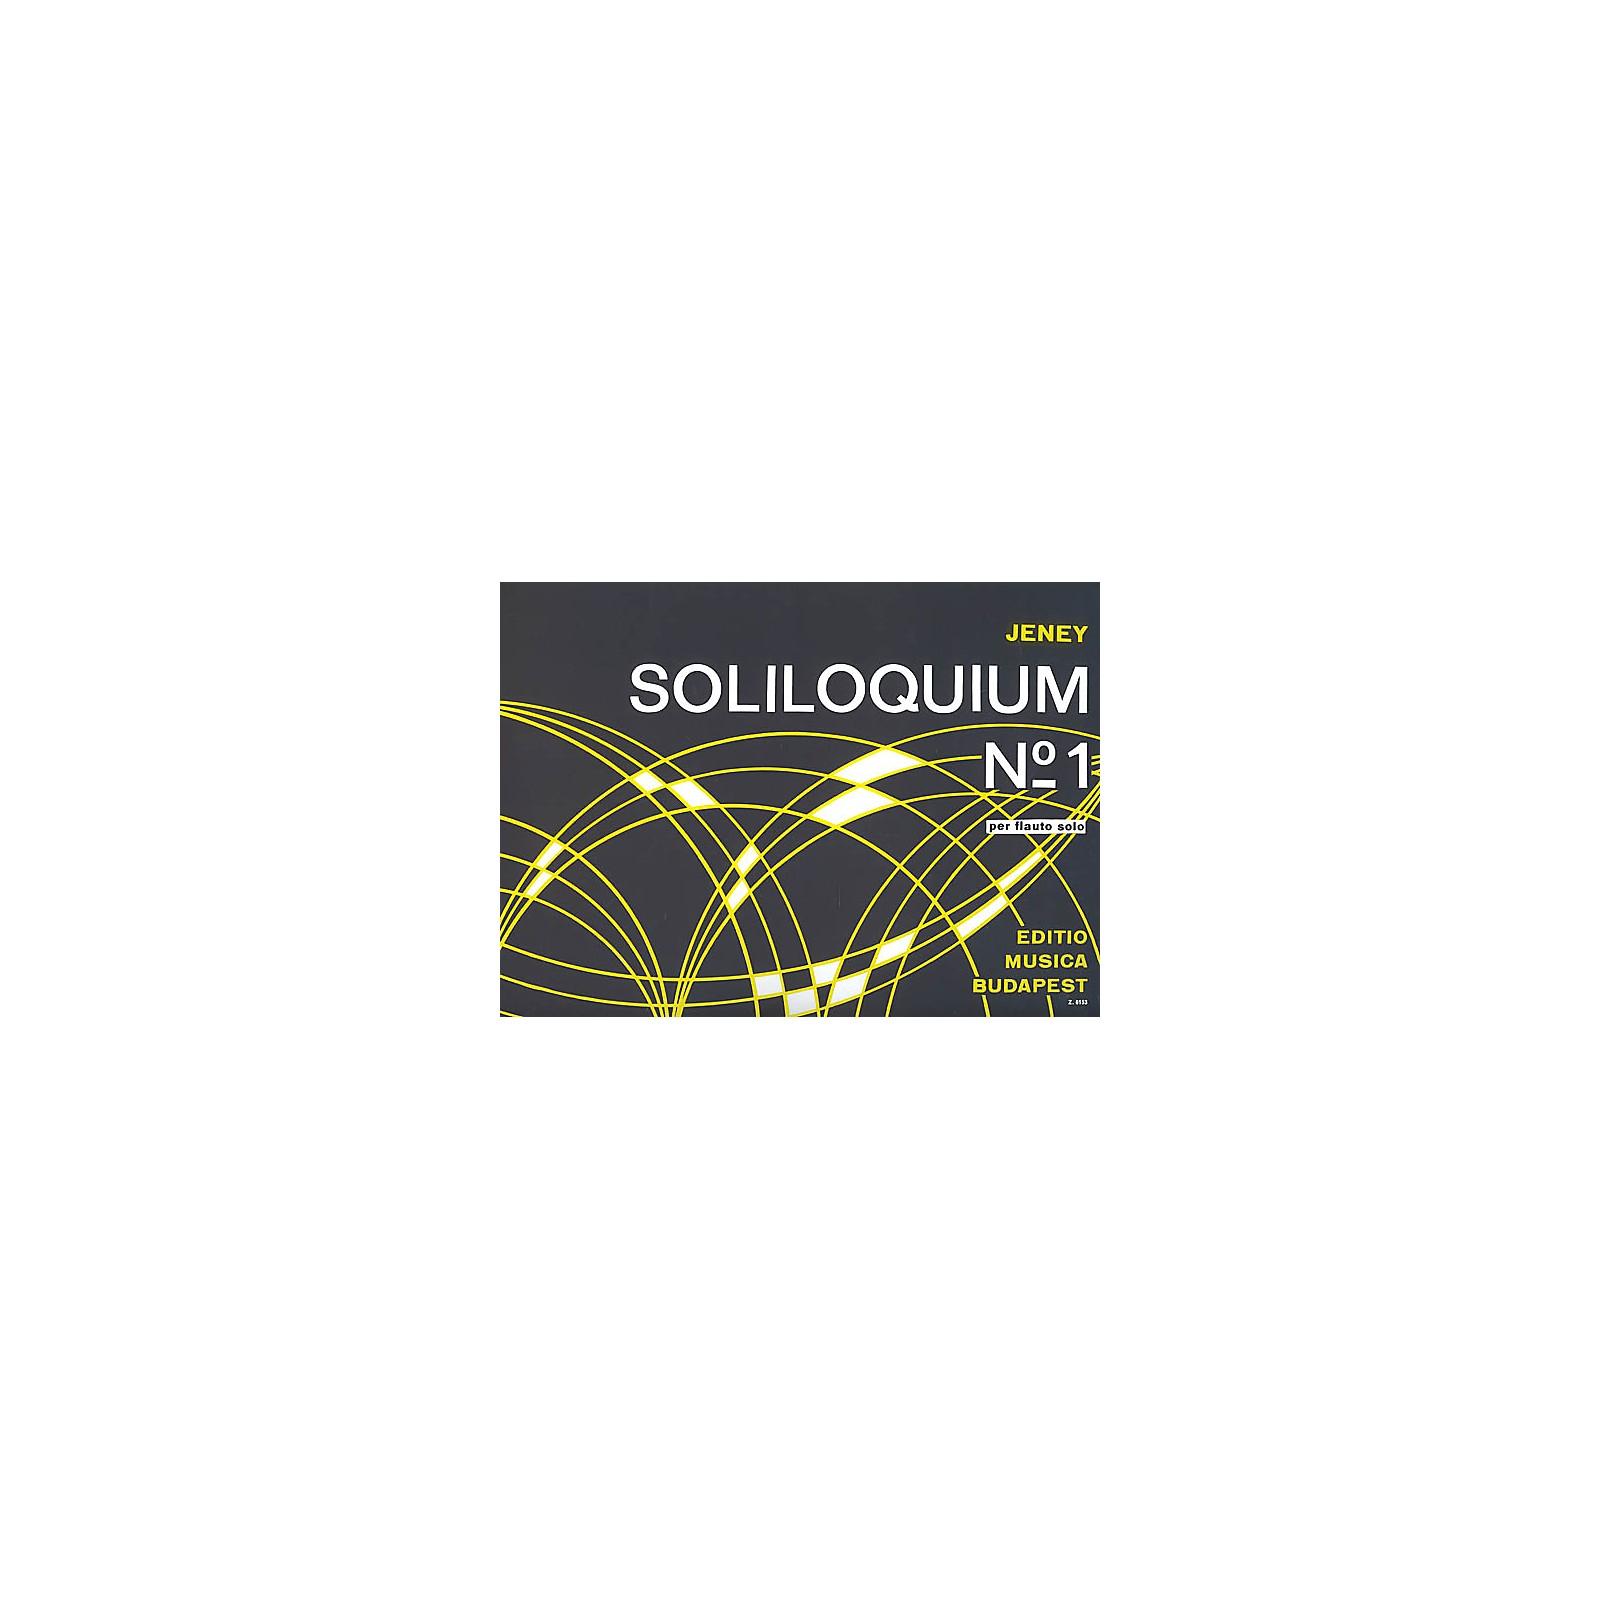 Editio Musica Budapest Soliloquium No. 1 EMB Series by Zoltán Jeney